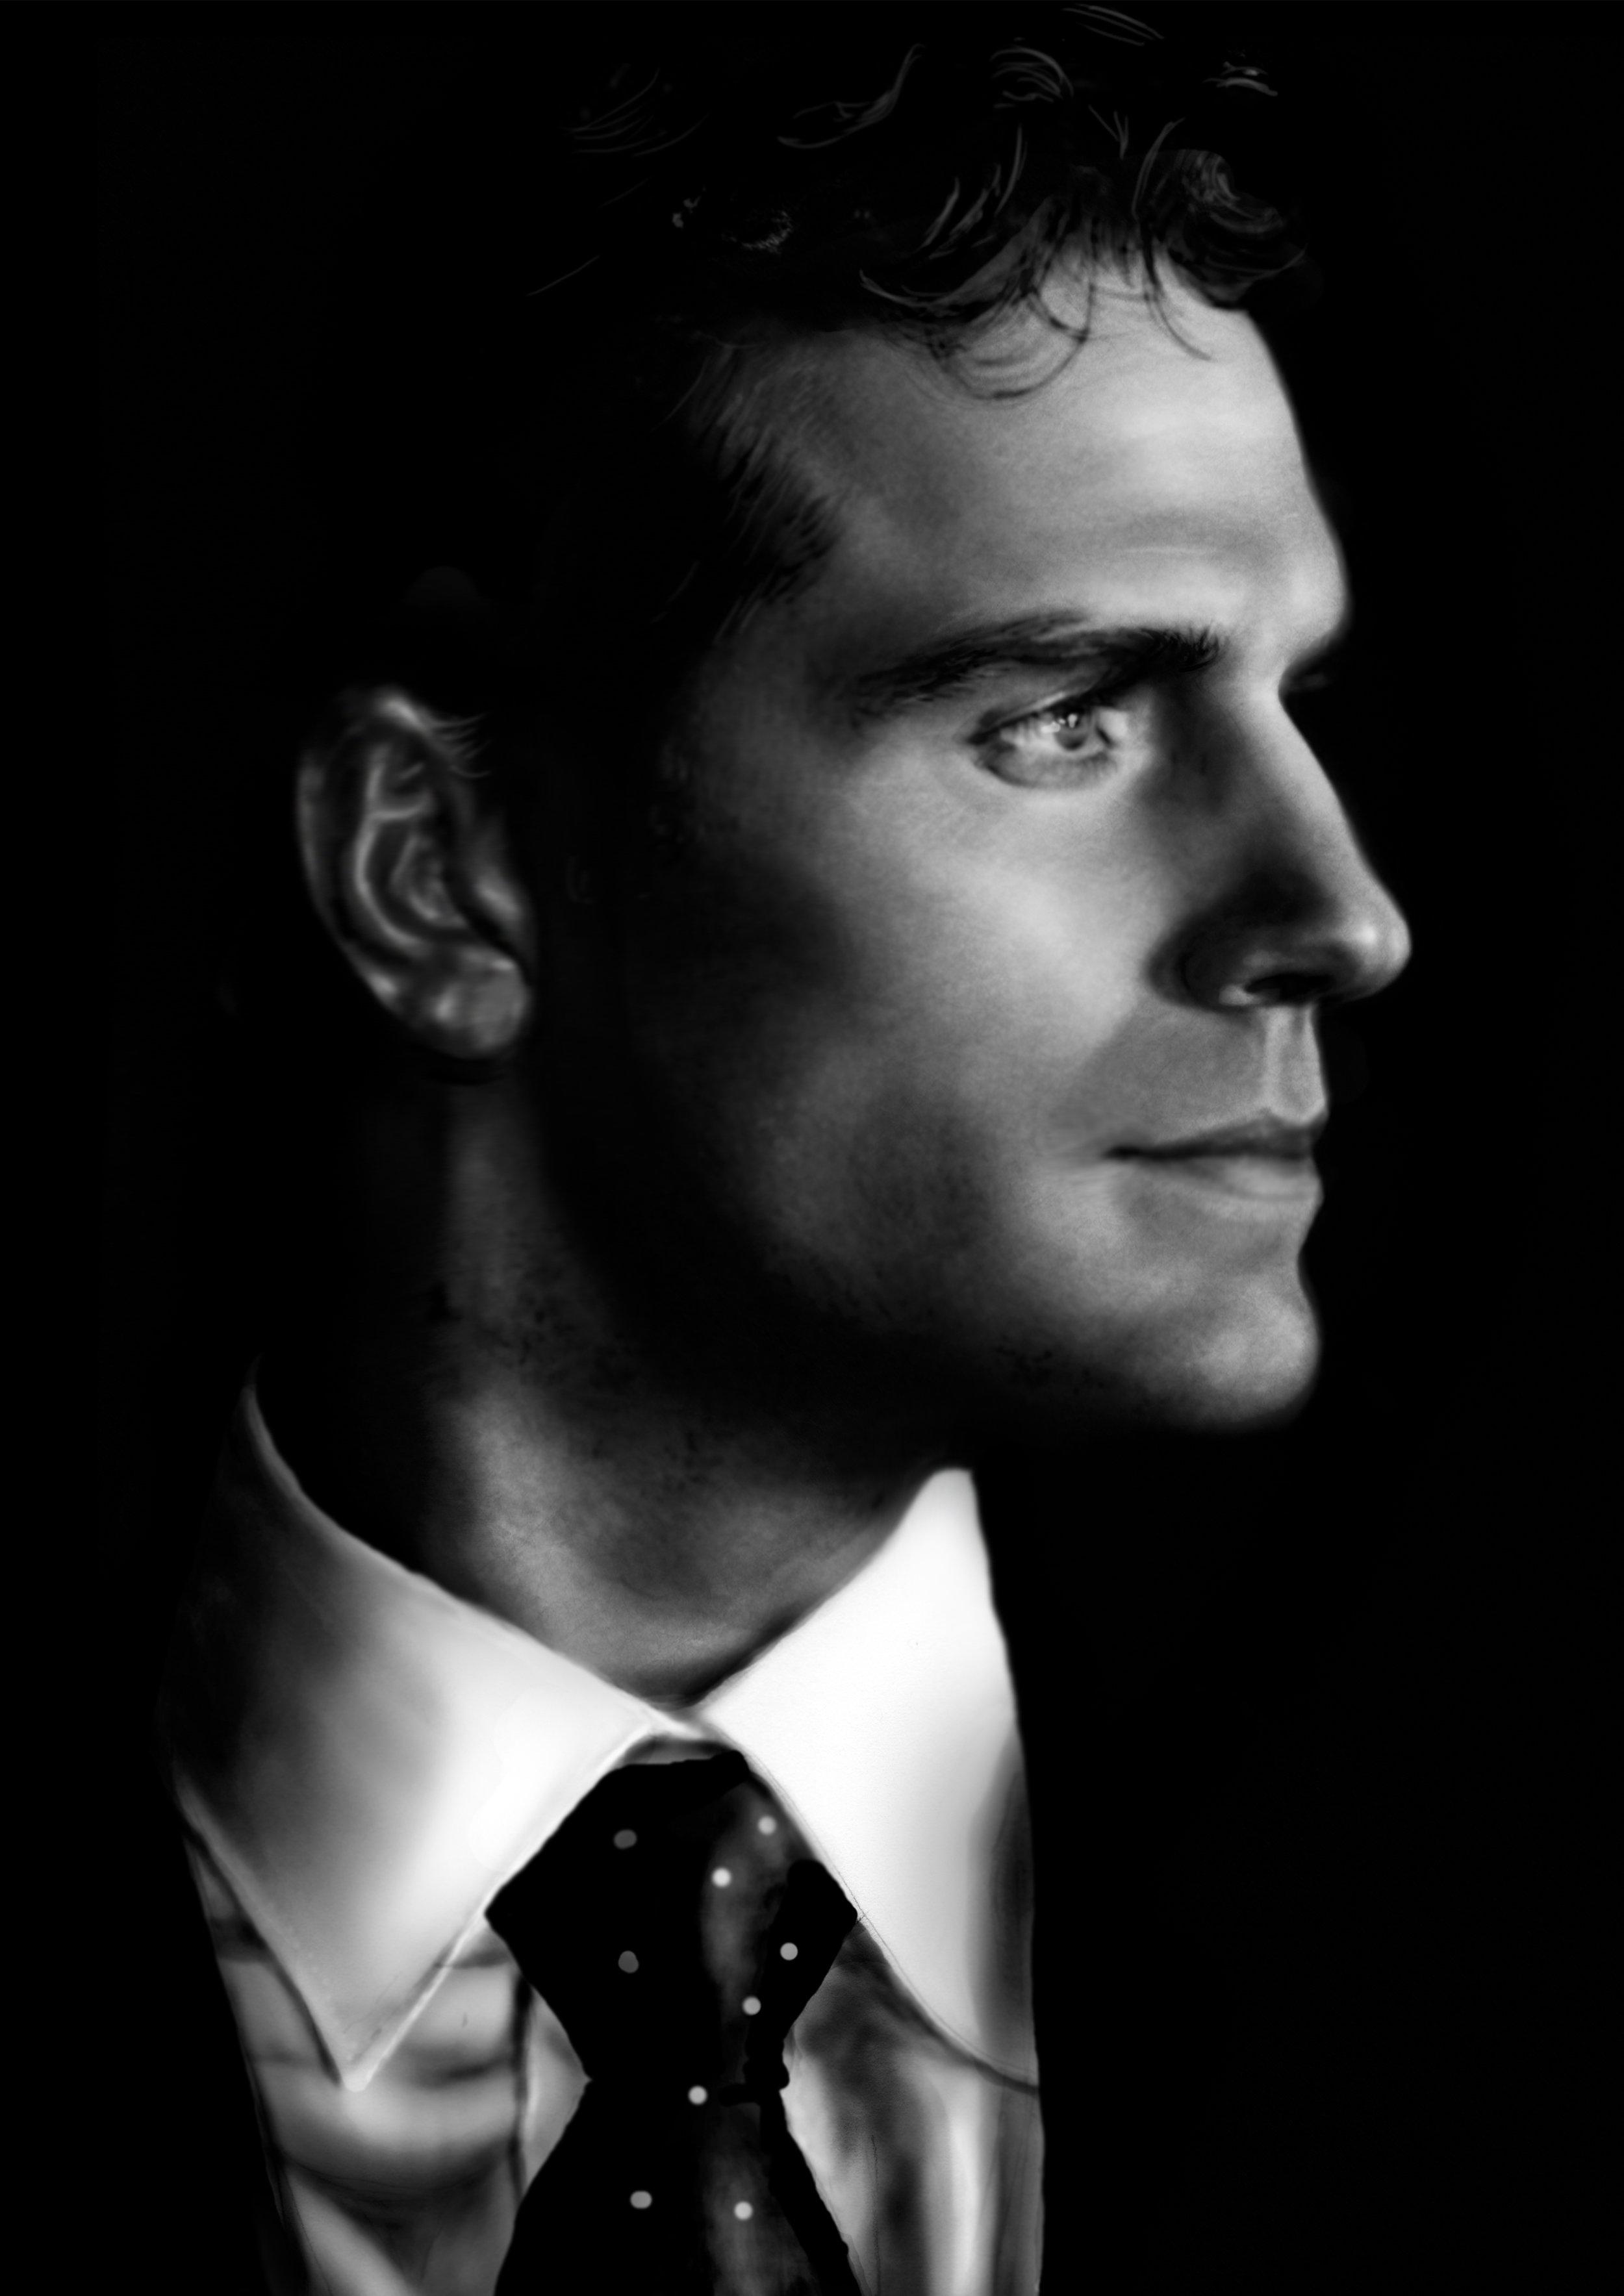 Henry Cavill portrait v2 copy.jpg